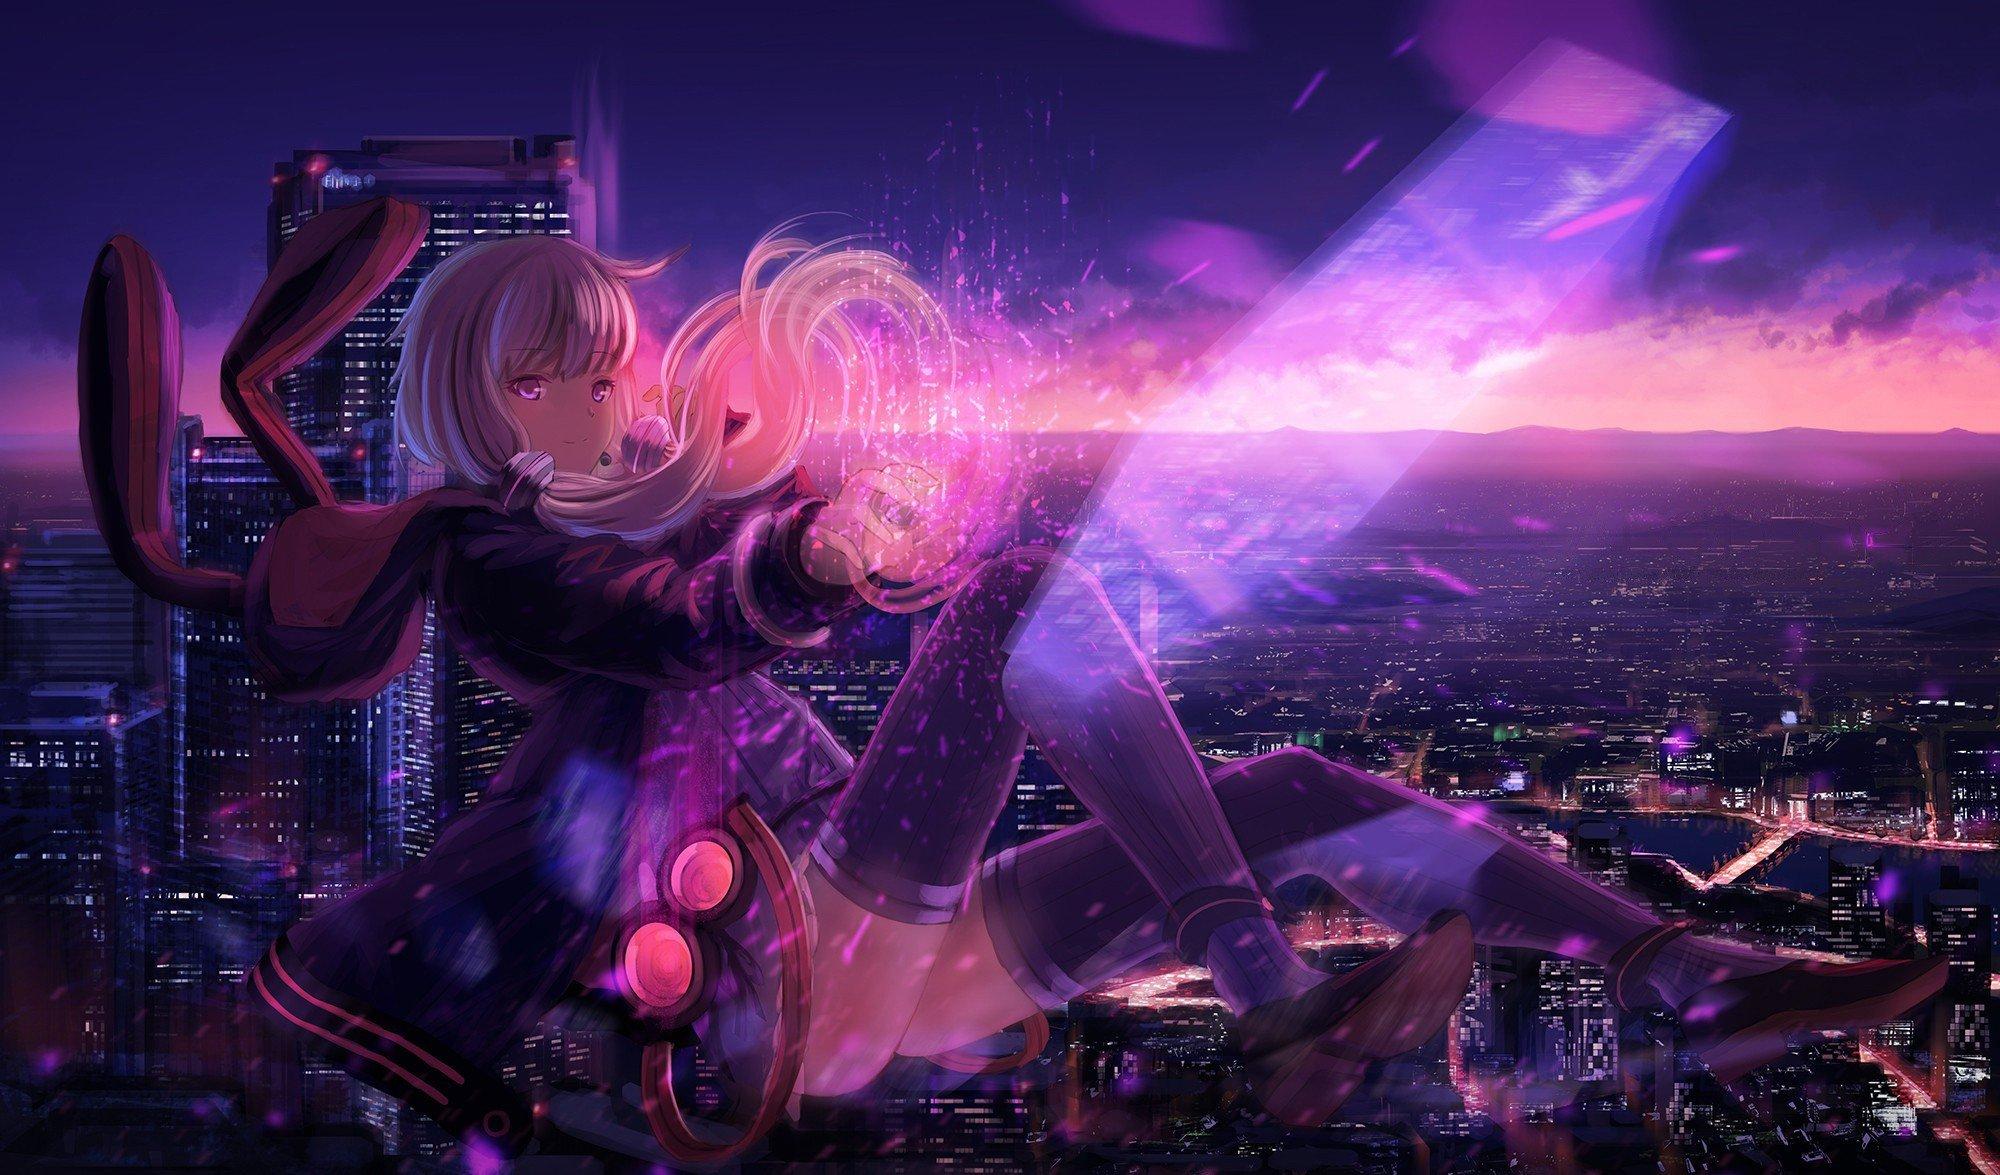 anime girls, Vocaloid, Yuzuki Yukari Wallpaper